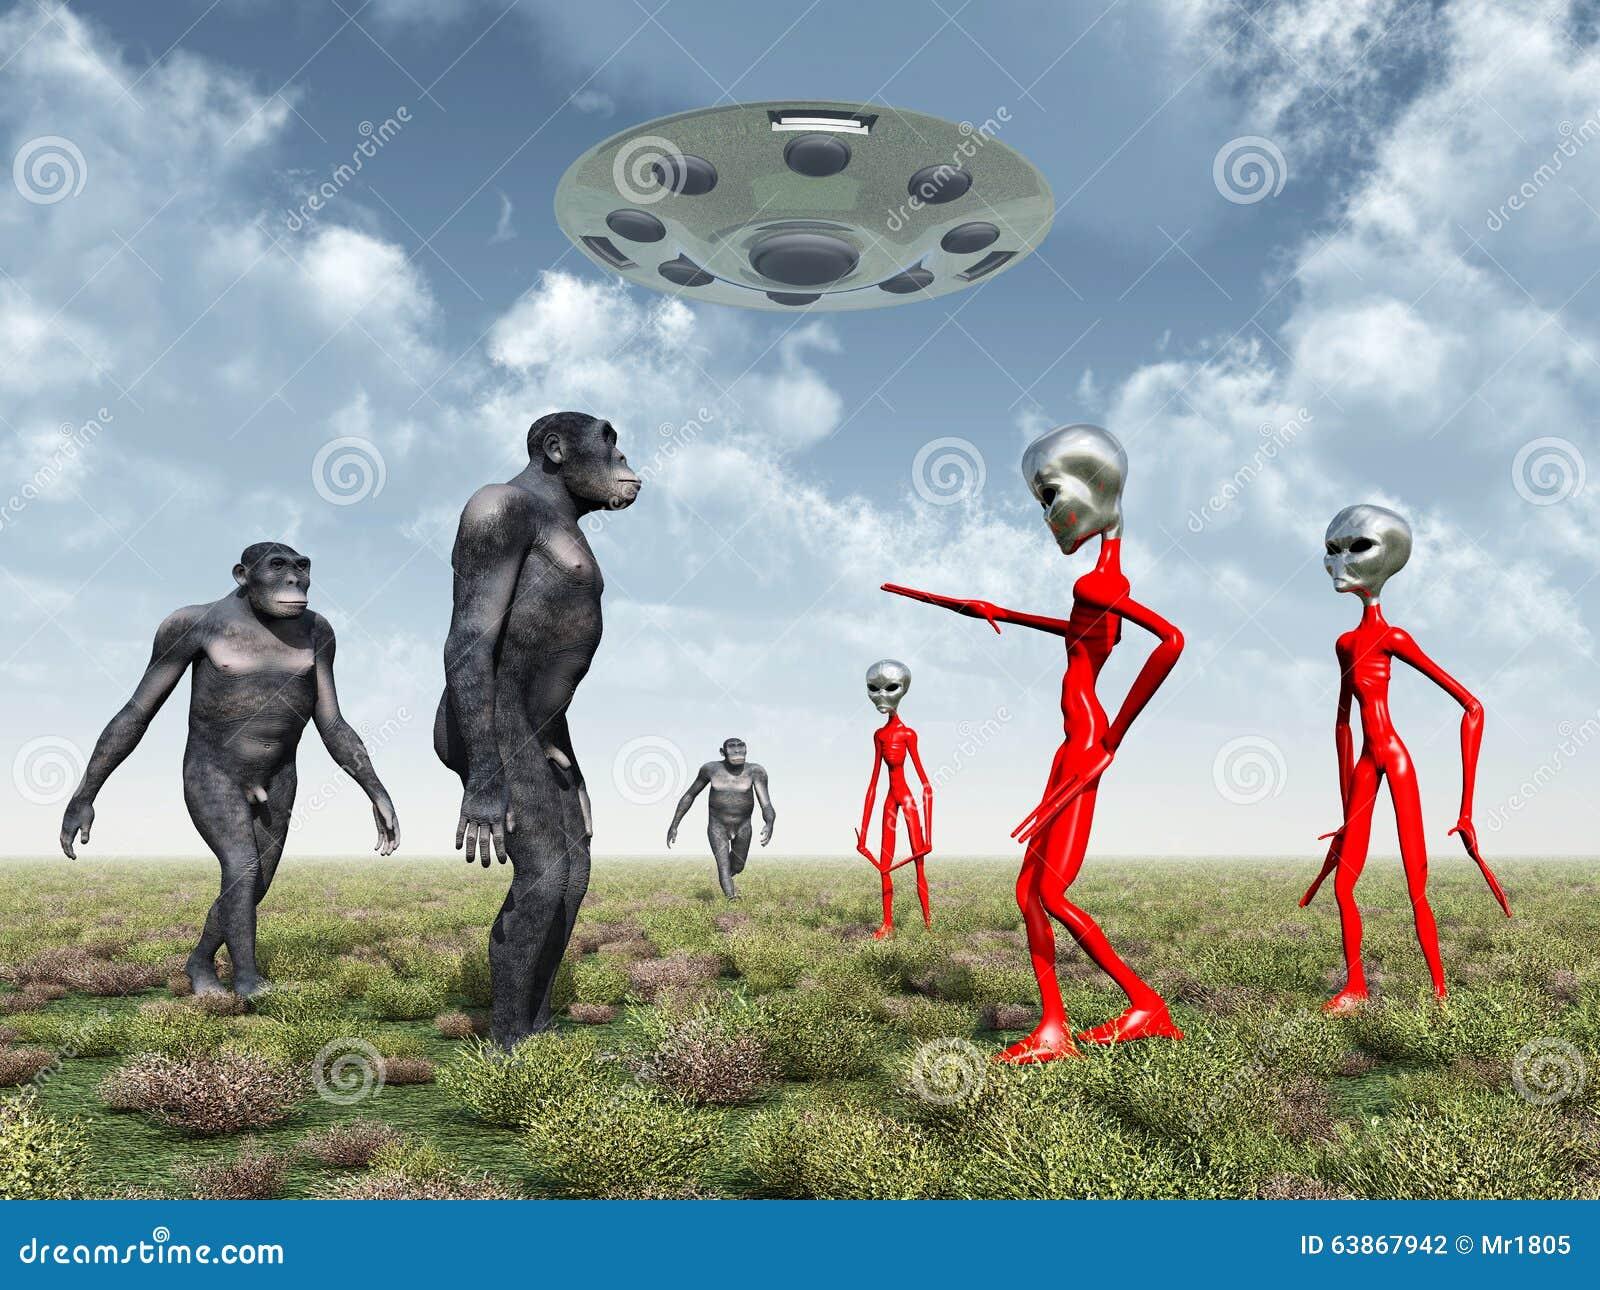 types of aliens great dreams types of aliens great dreams